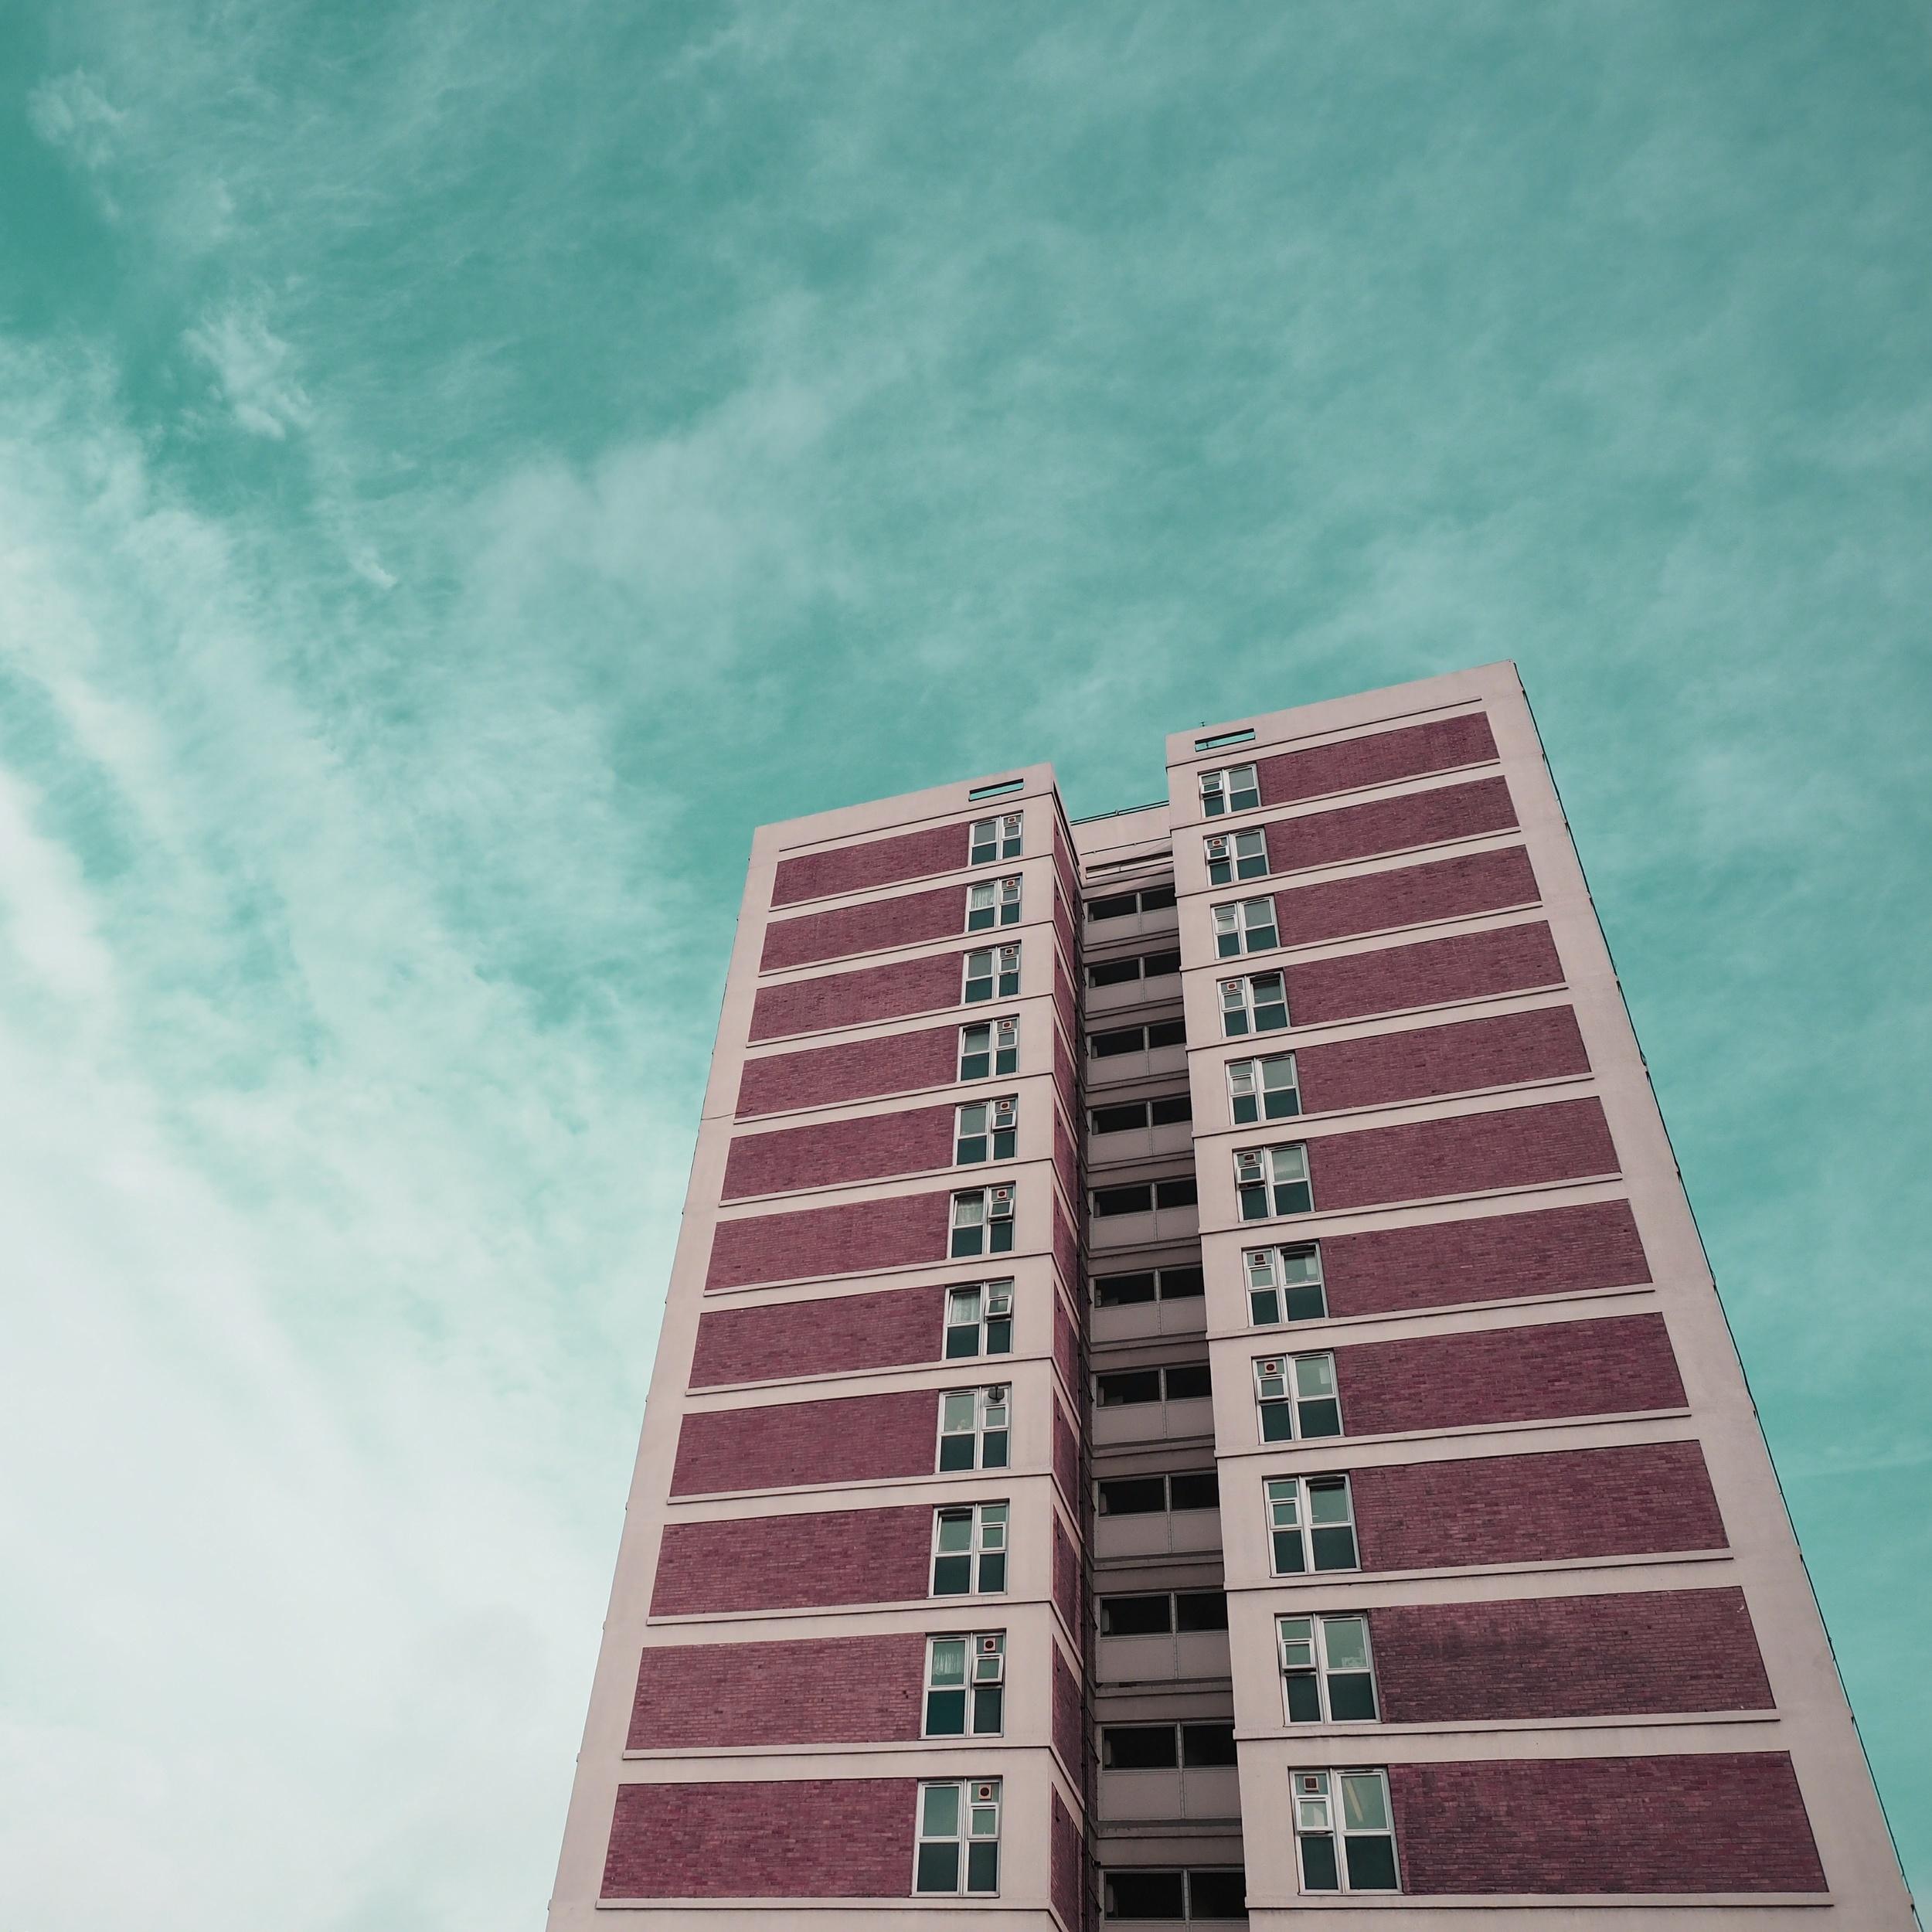 minimal-urban-photography